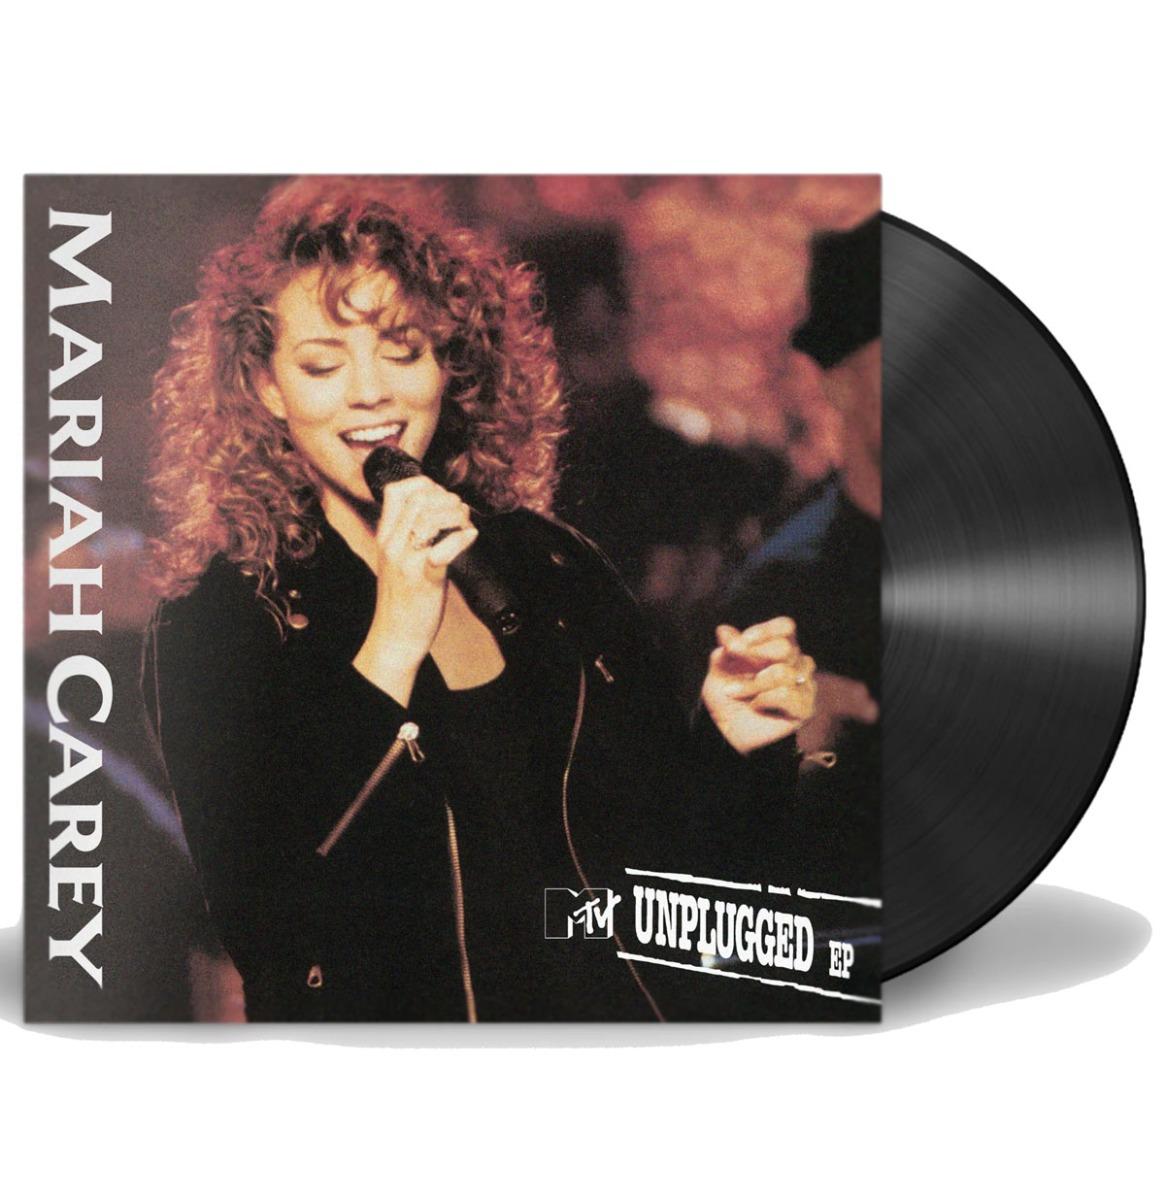 Mariah Carey - MTV Unplugged EP LP